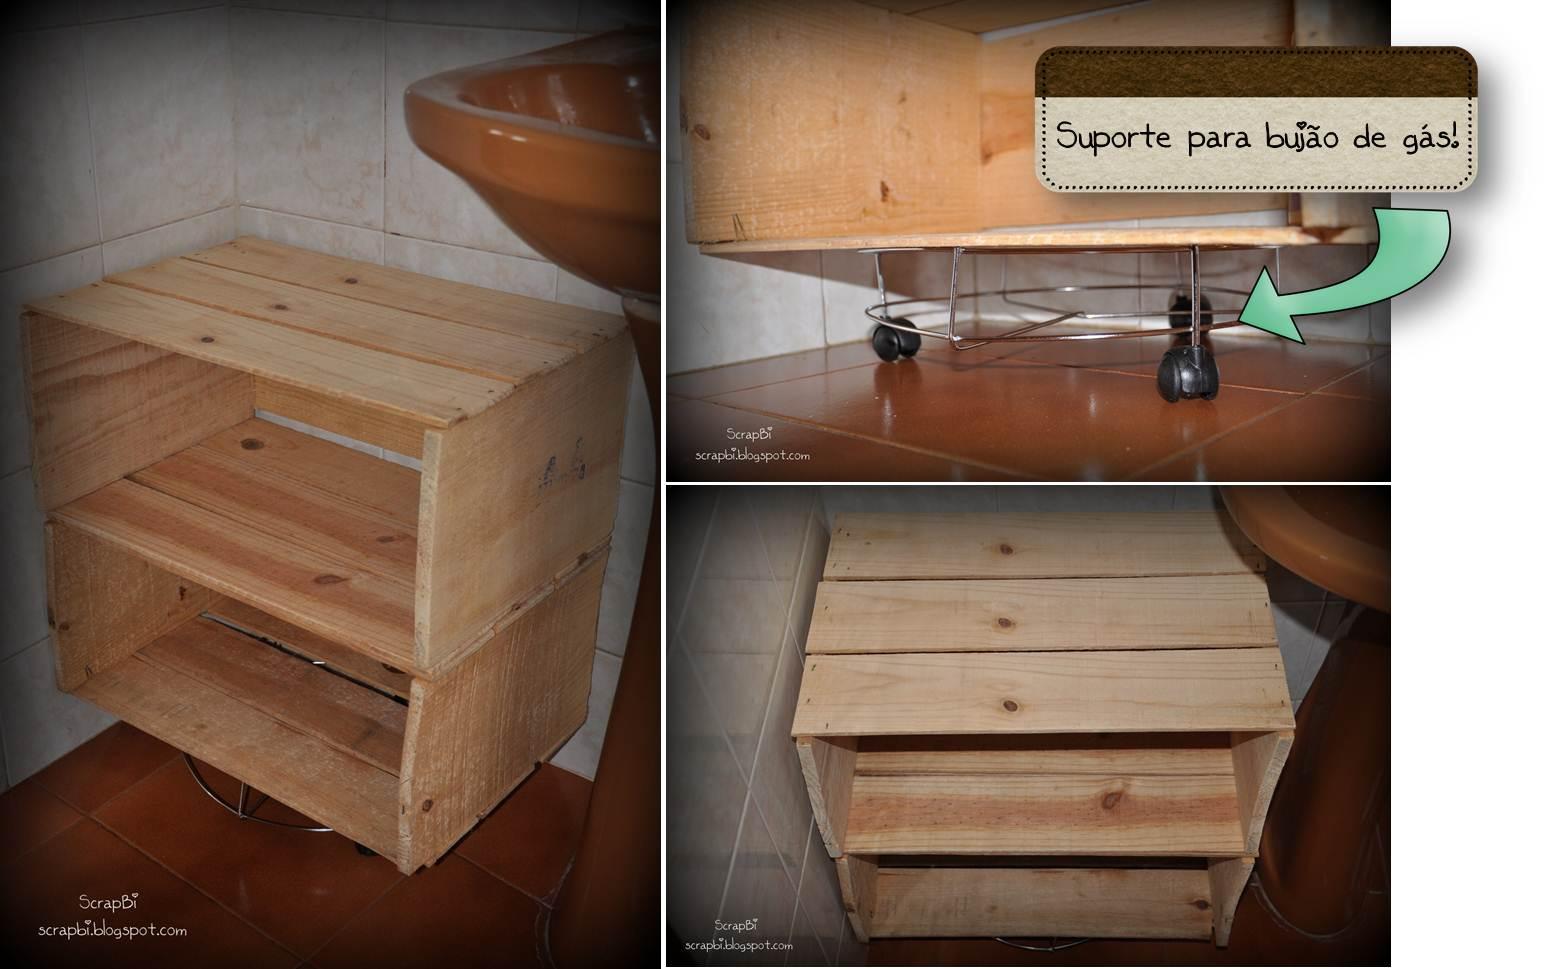 Caixas de feira arm rio do banheiro scrapbi - Como hacer puertas de armario ...